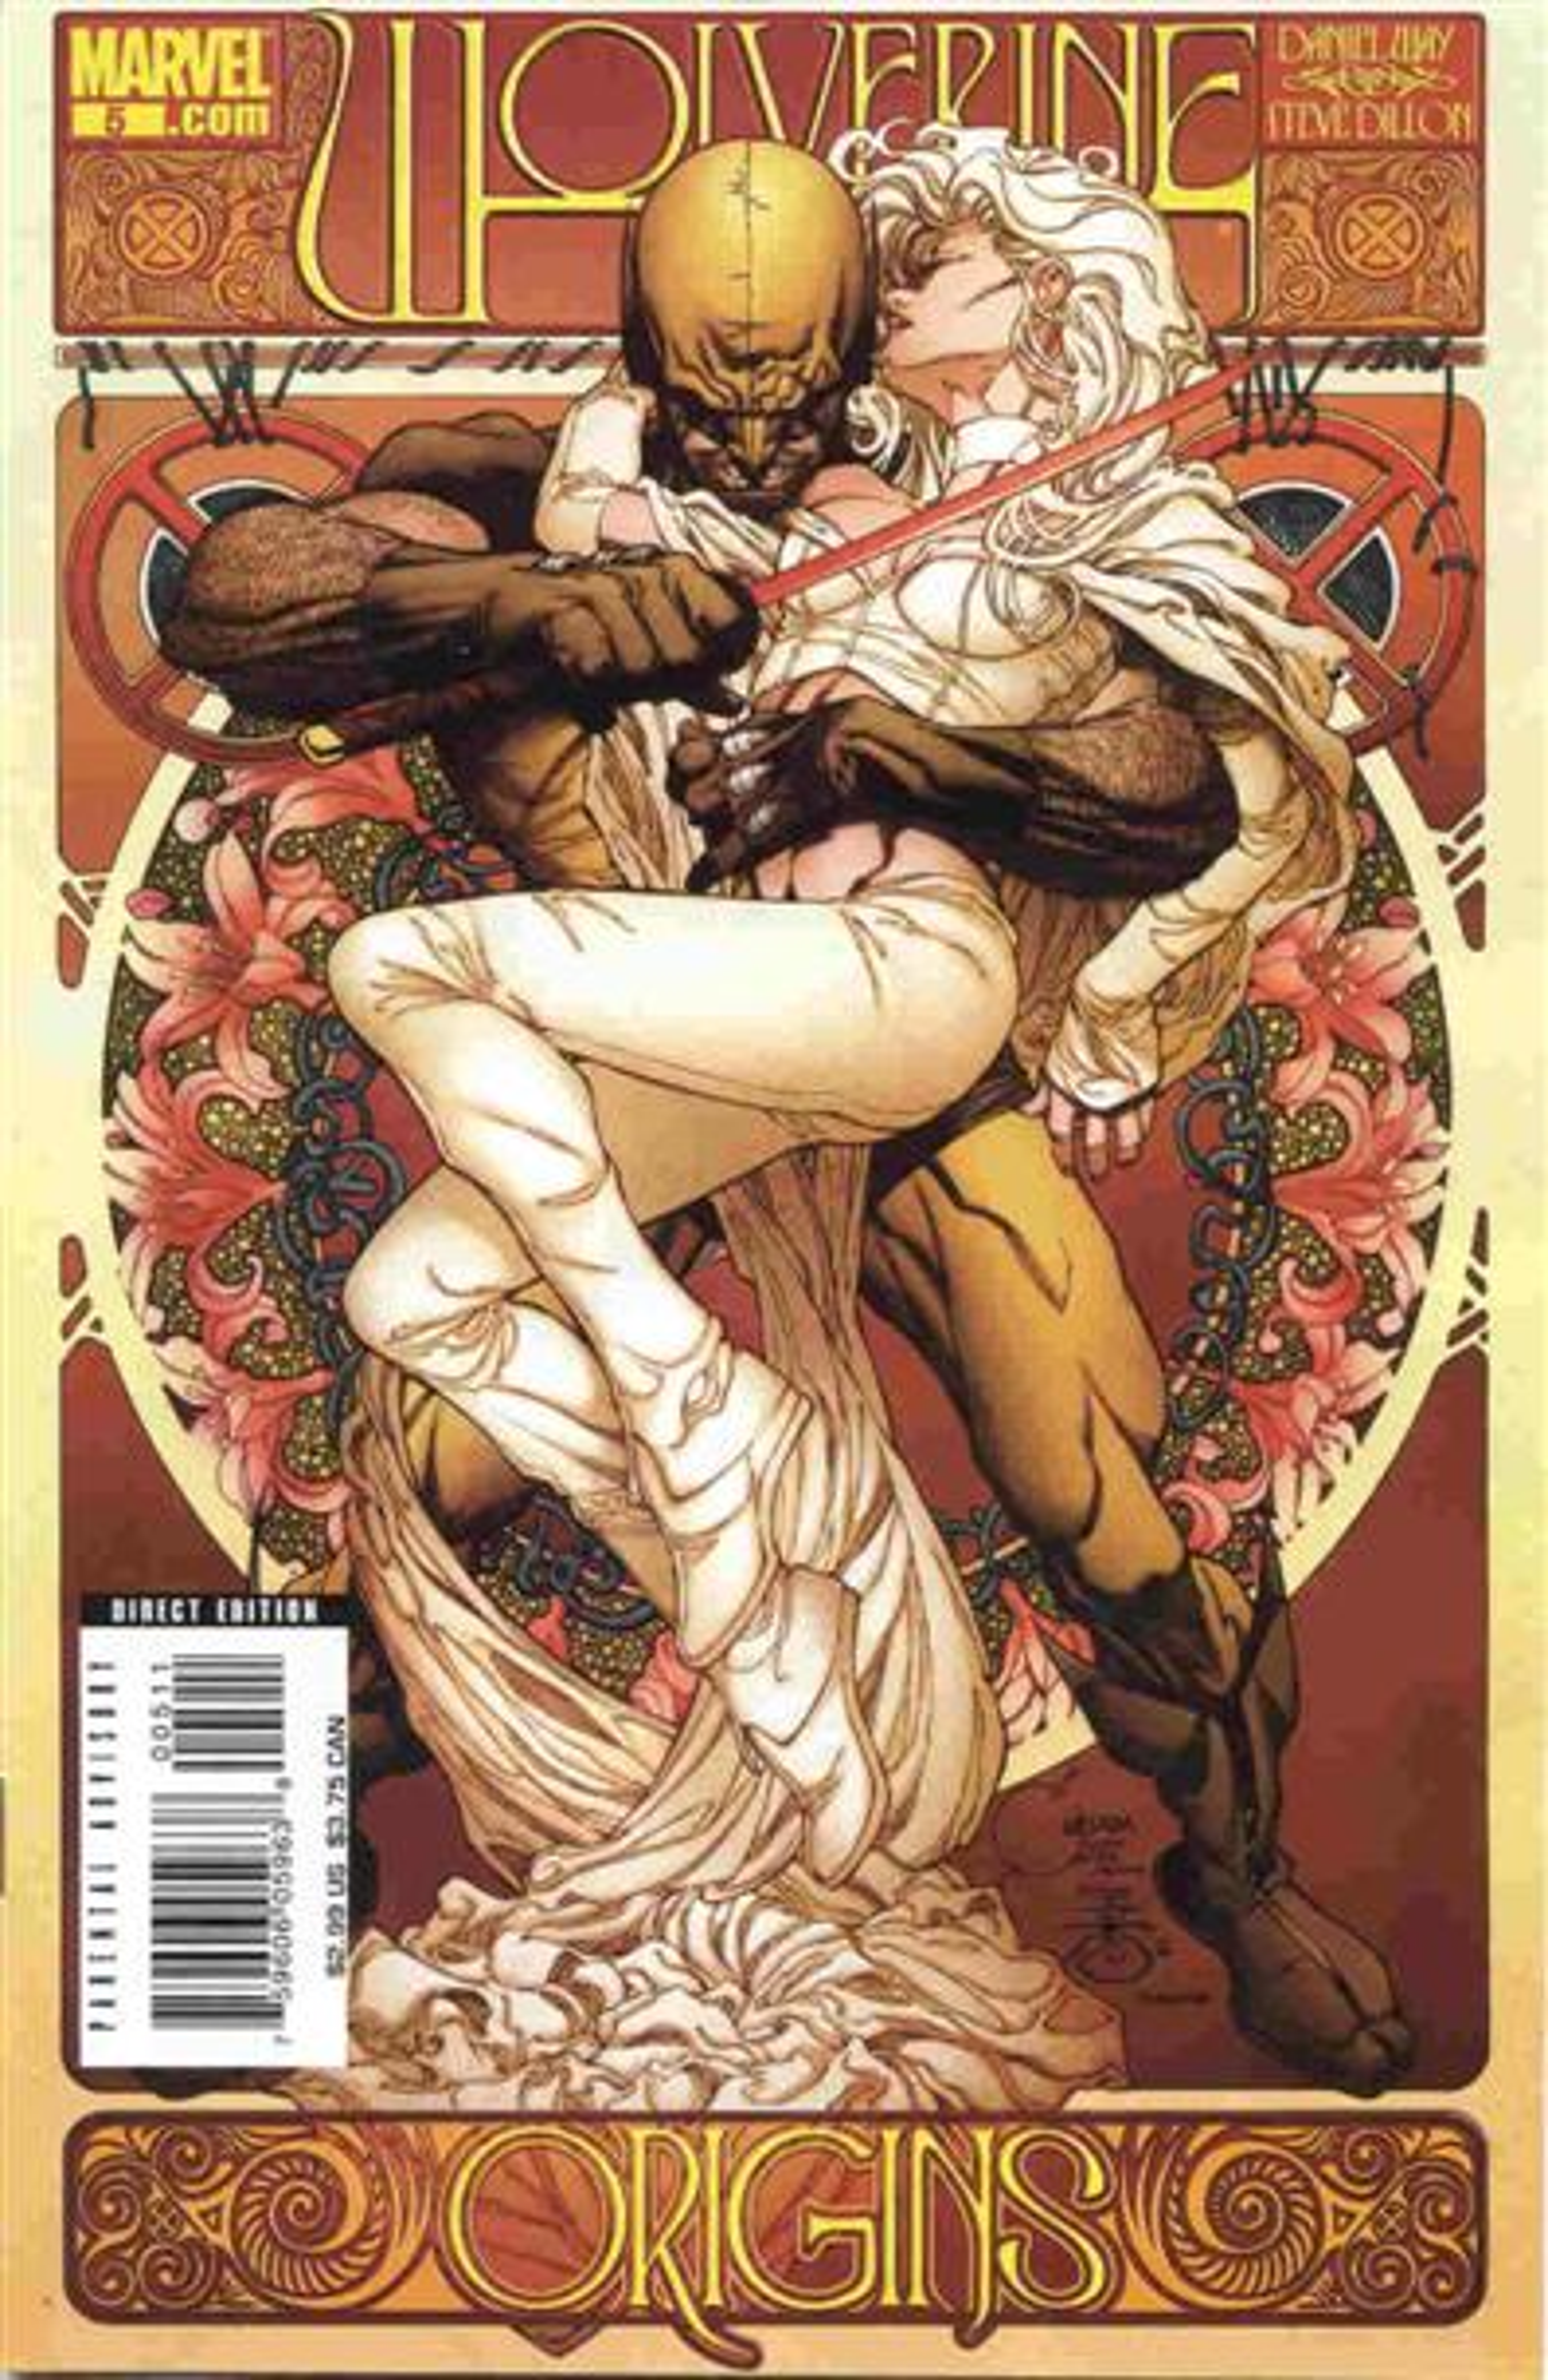 Wolverine: Origins Vol 1 5